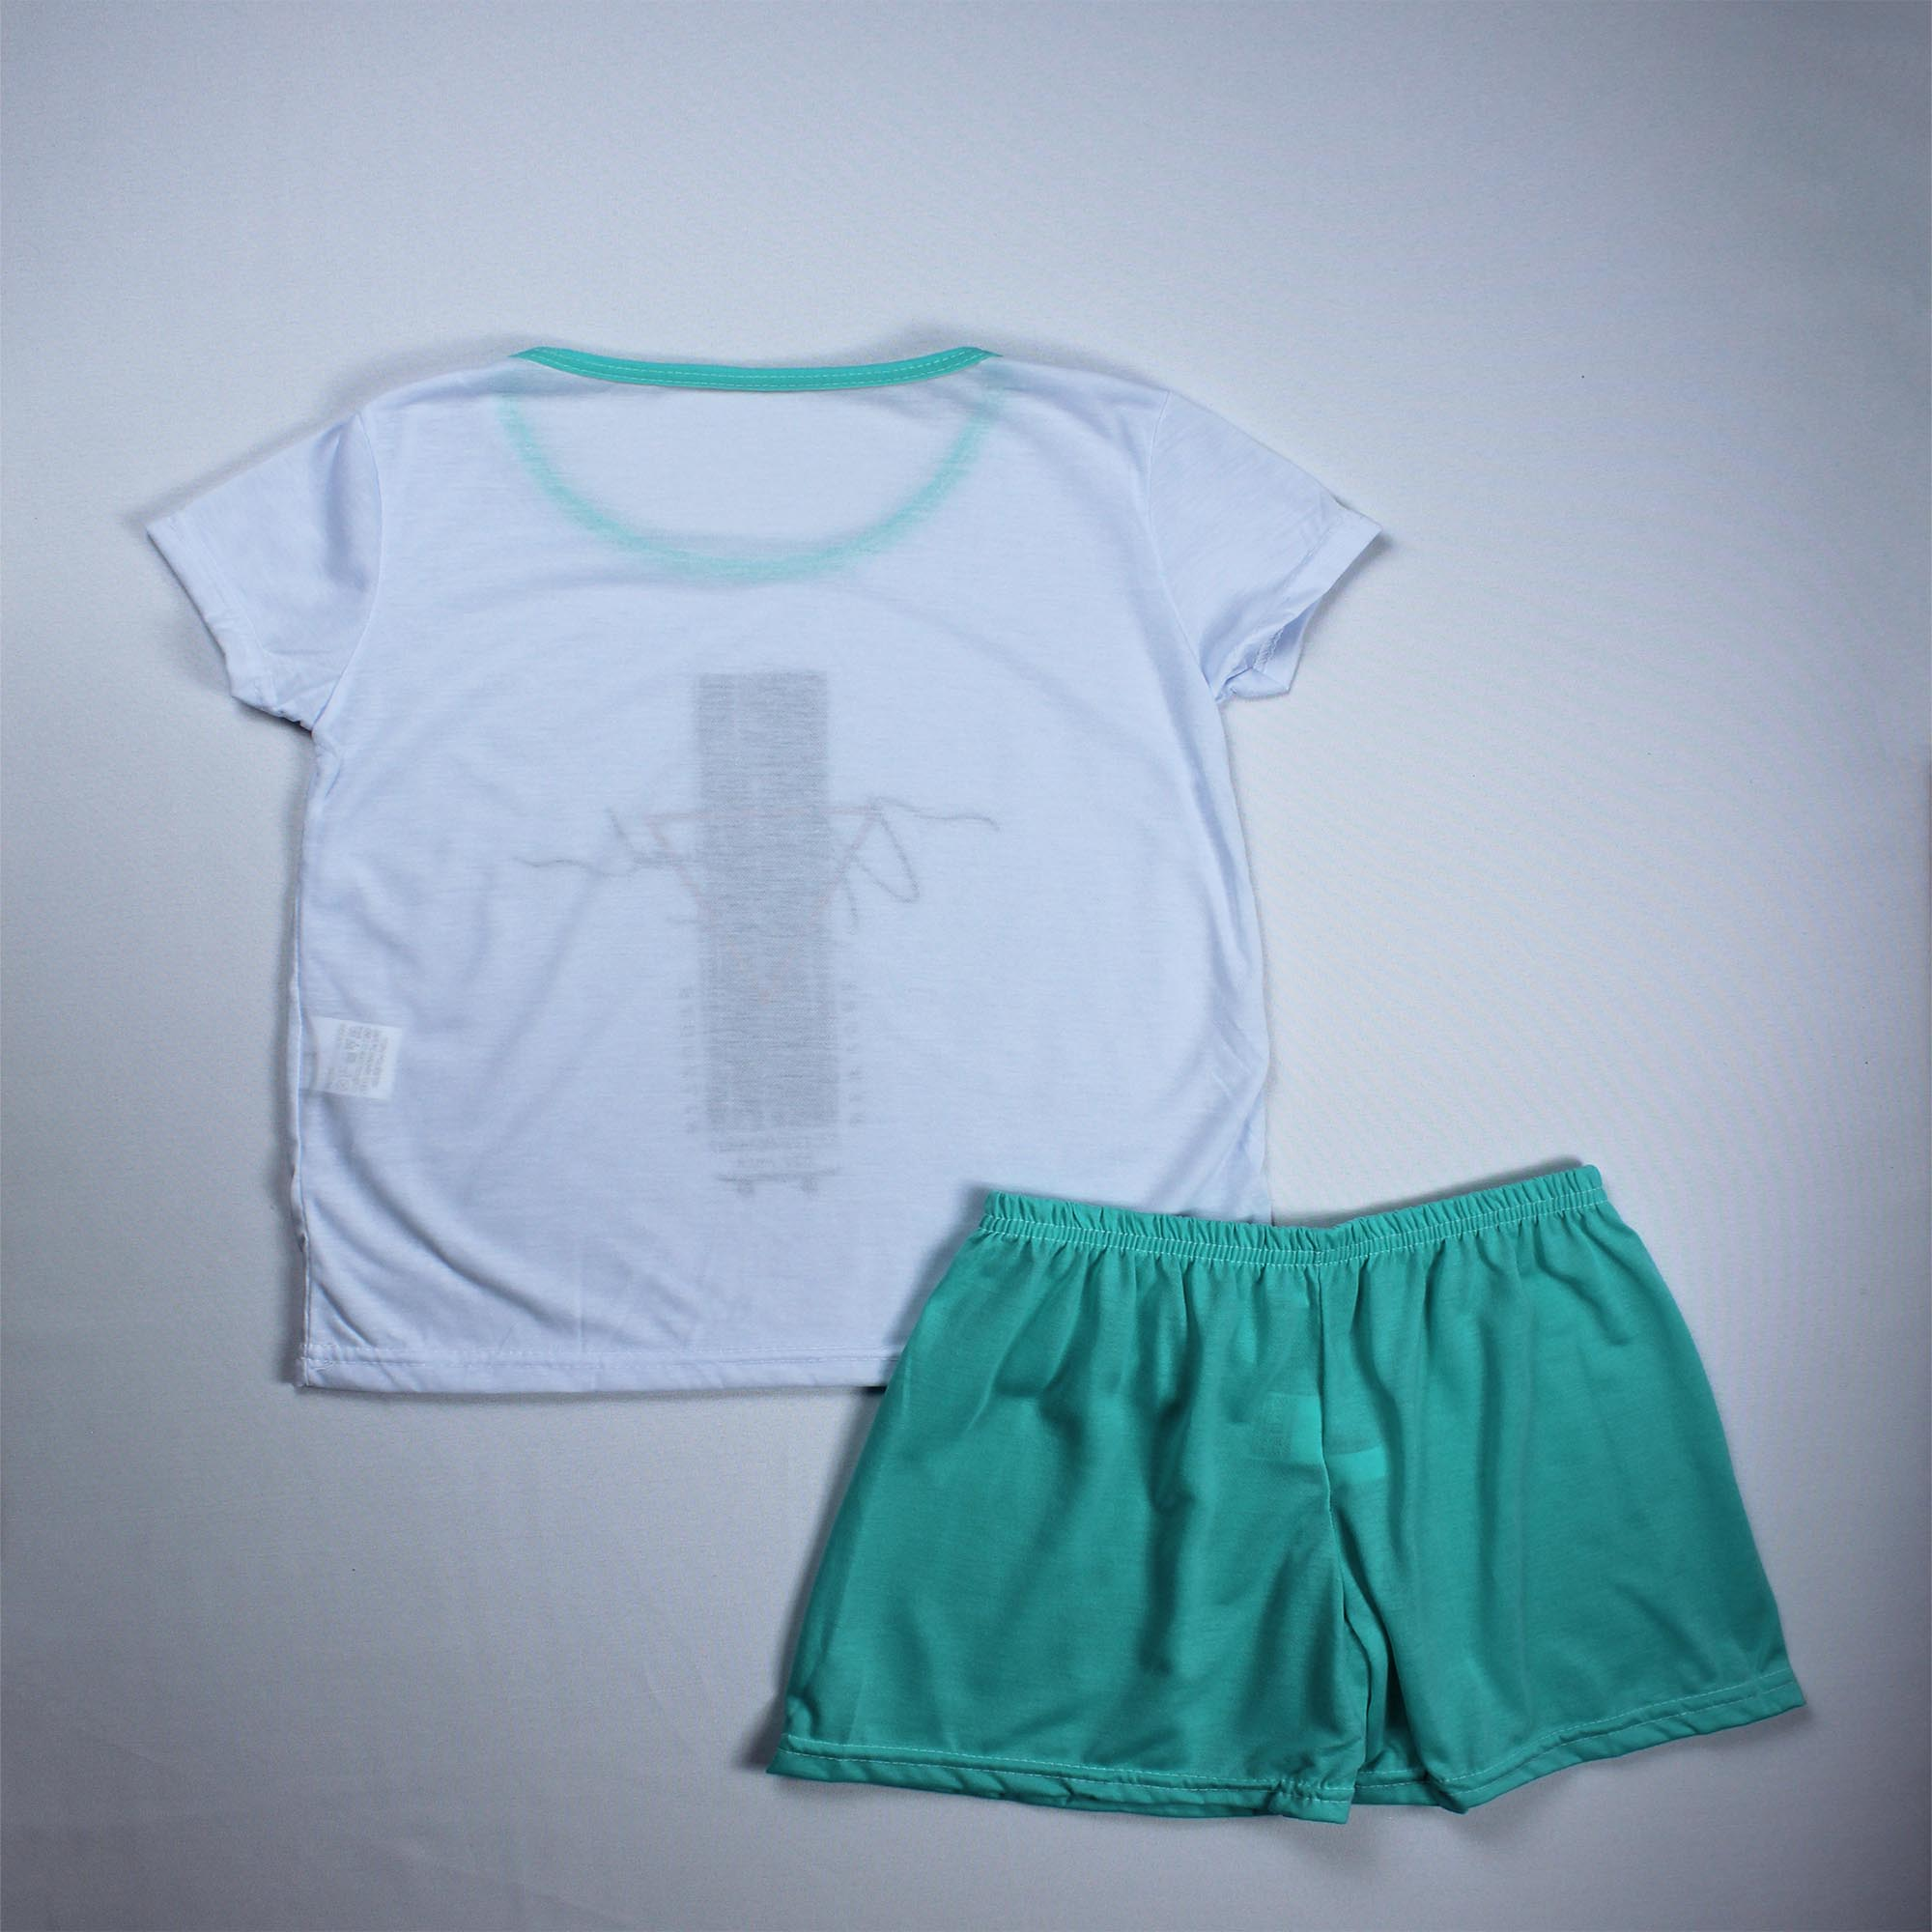 Pijama Infantil Menino - Tamanho 12